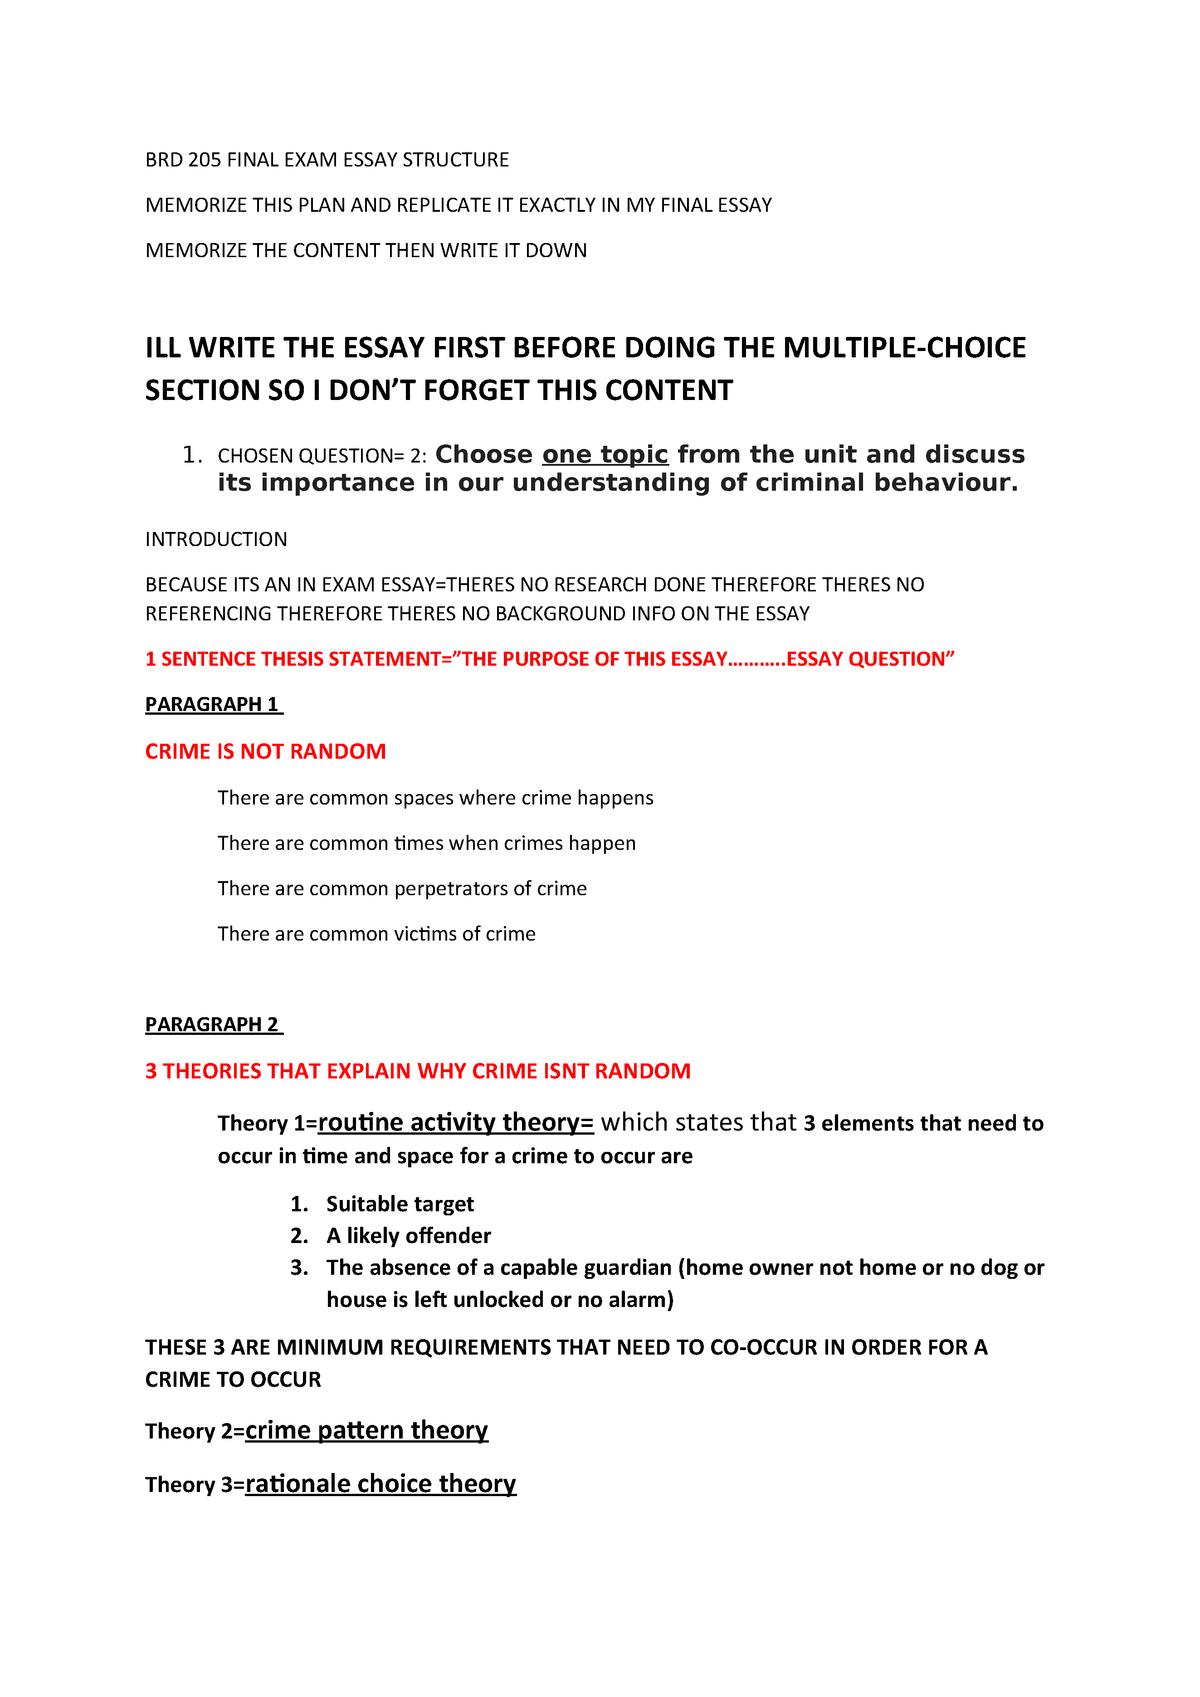 BRD 205 Final EXAM Essay Structure - BRD205 - StuDocu